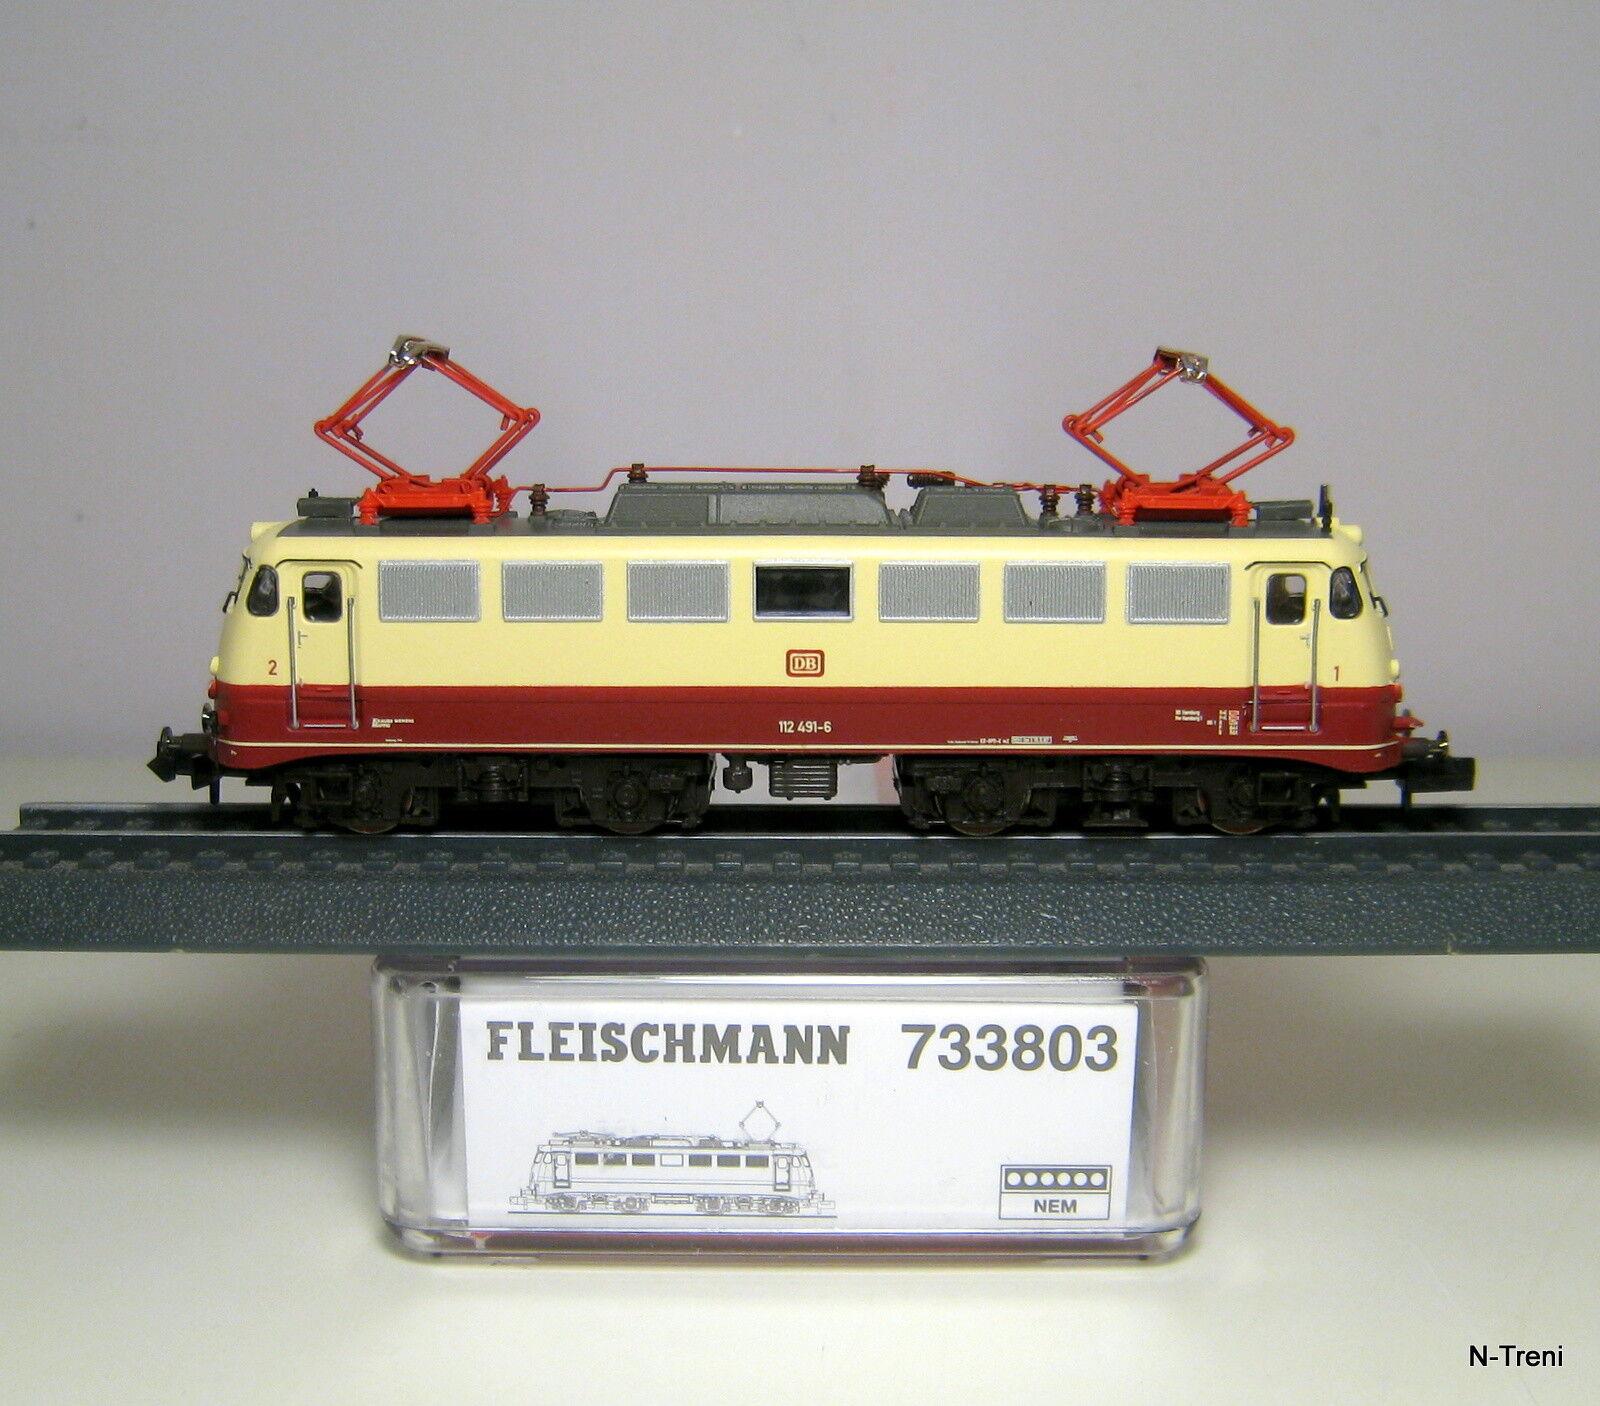 Fleischmann N 733803 K - Loco elettrica BR  in livrea TEE delle DB. Epoca IV